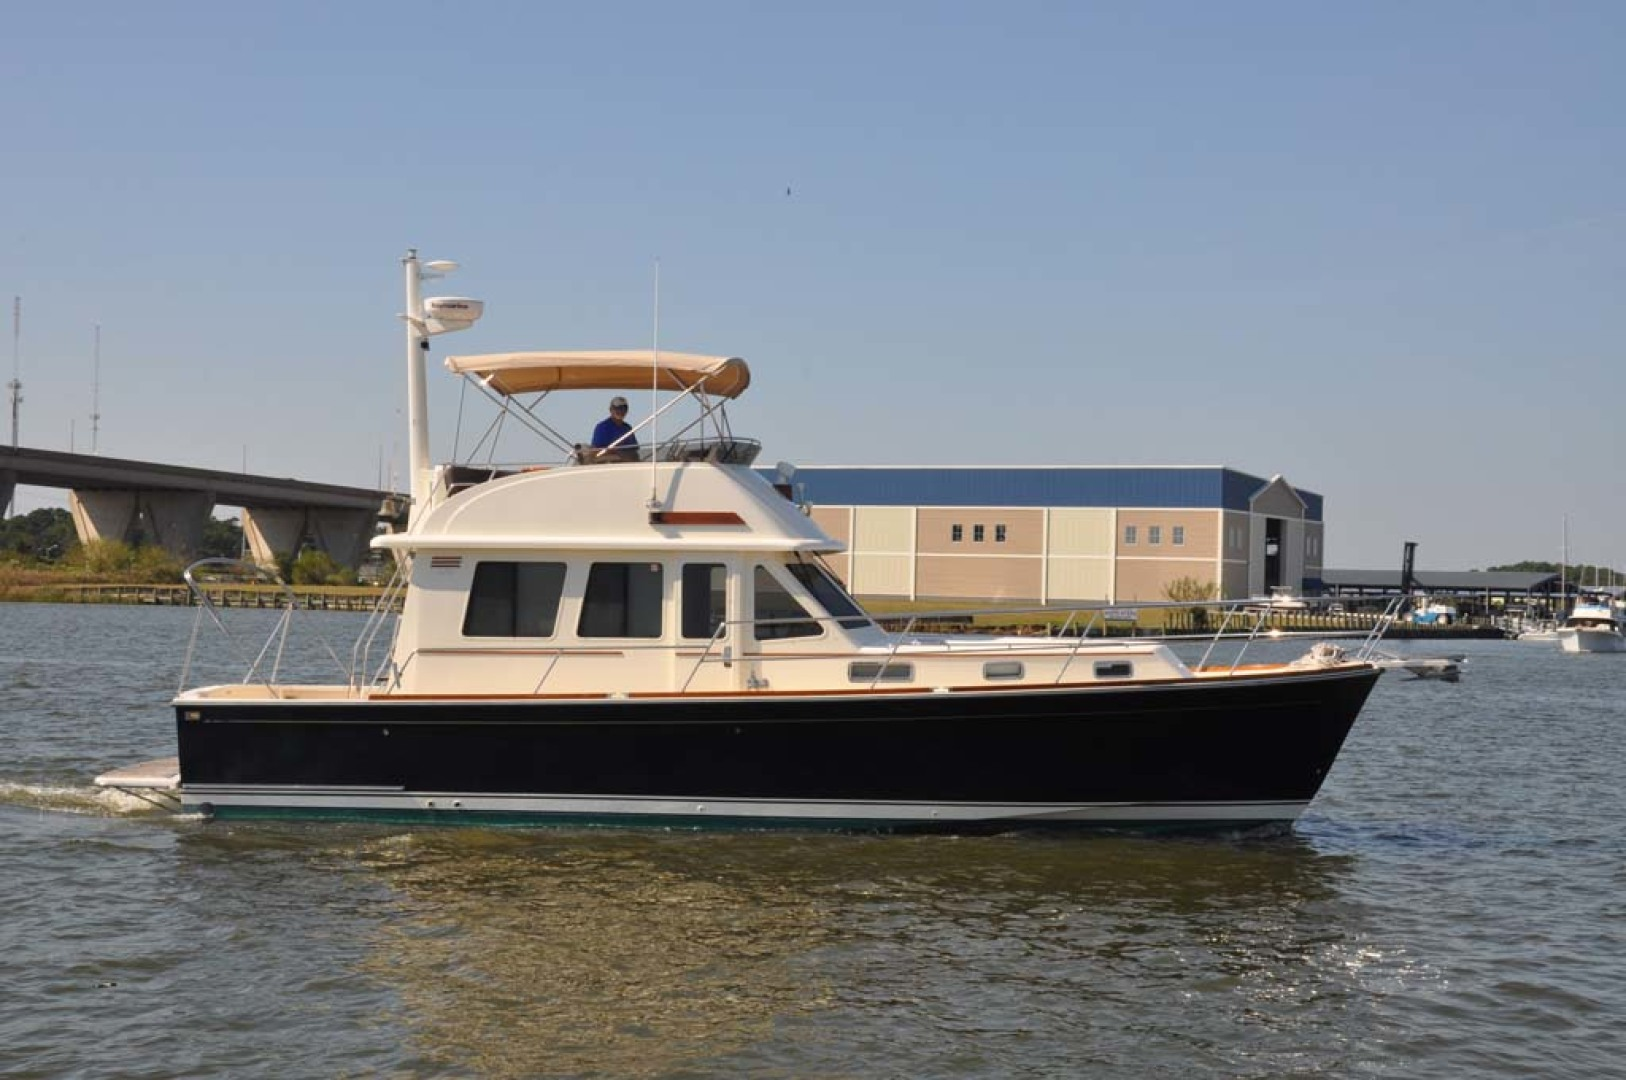 Sabre-42-Sedan-2006-C-Est-Sea-Bon-Grasonville-Maryland-United-States-Profile-1071761